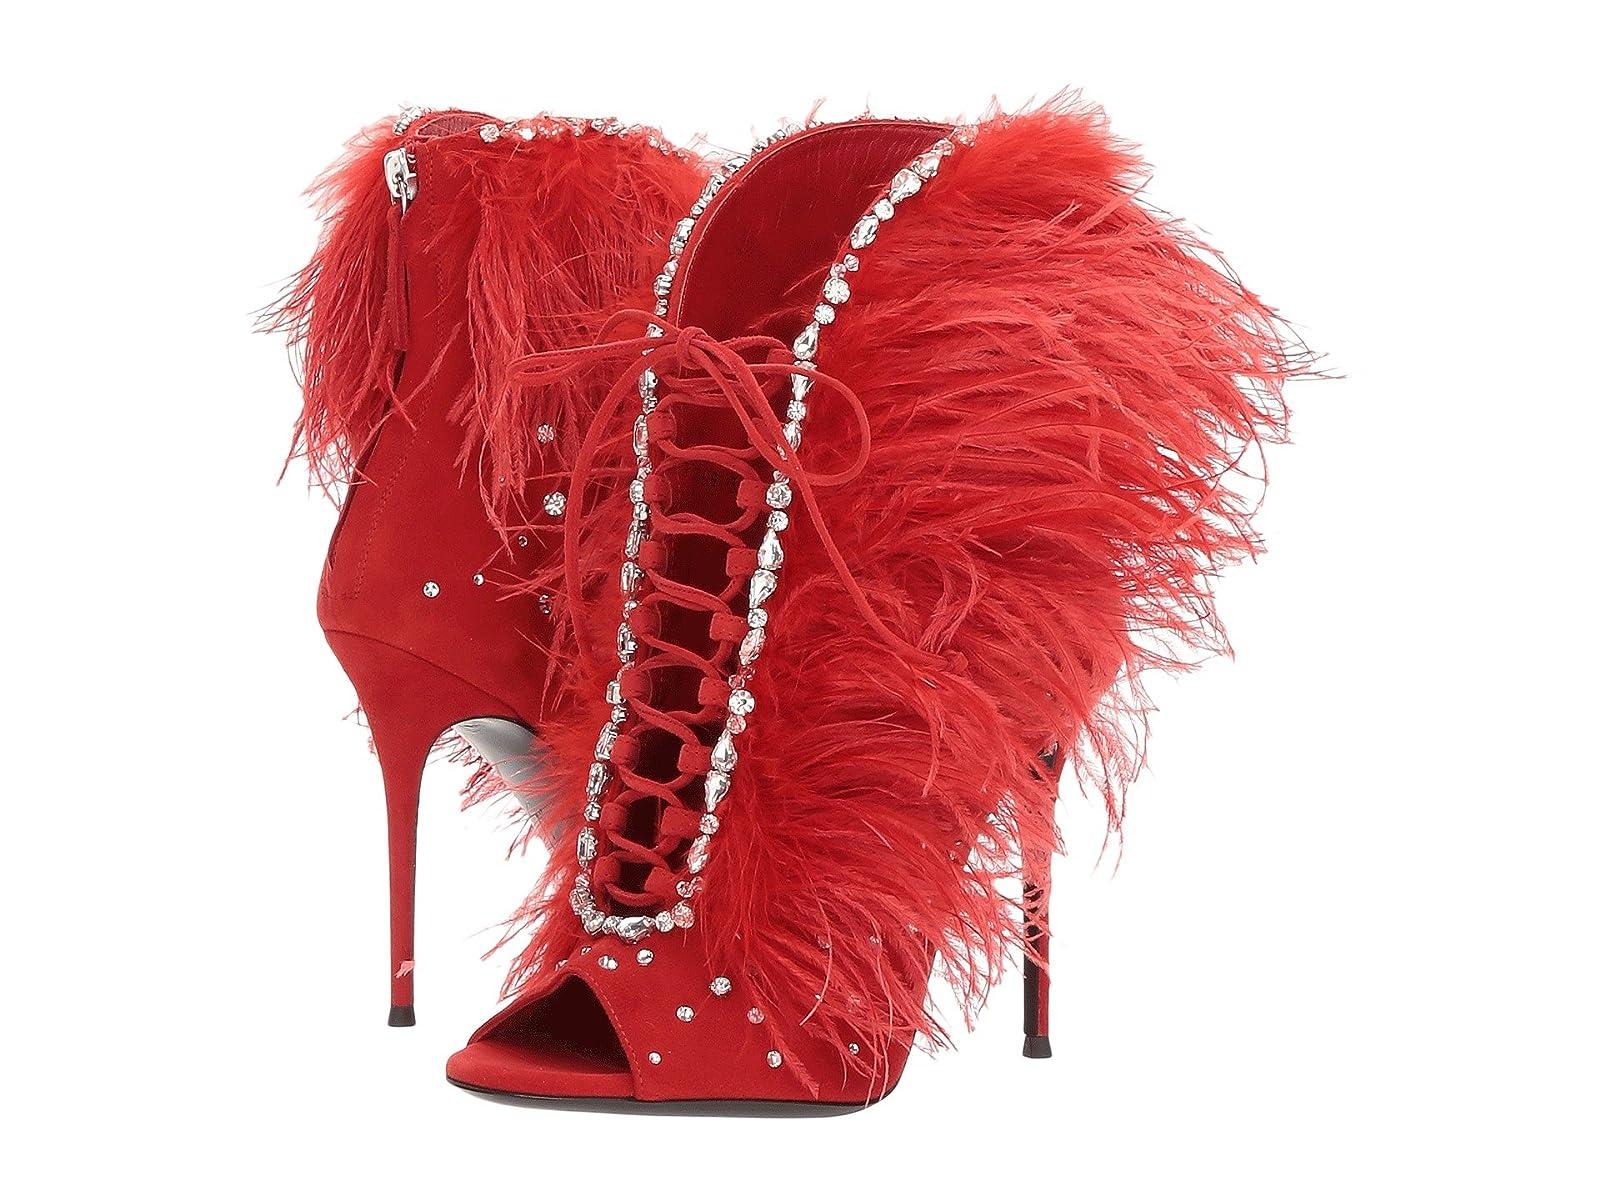 Giuseppe Zanotti I770069Cheap and distinctive eye-catching shoes